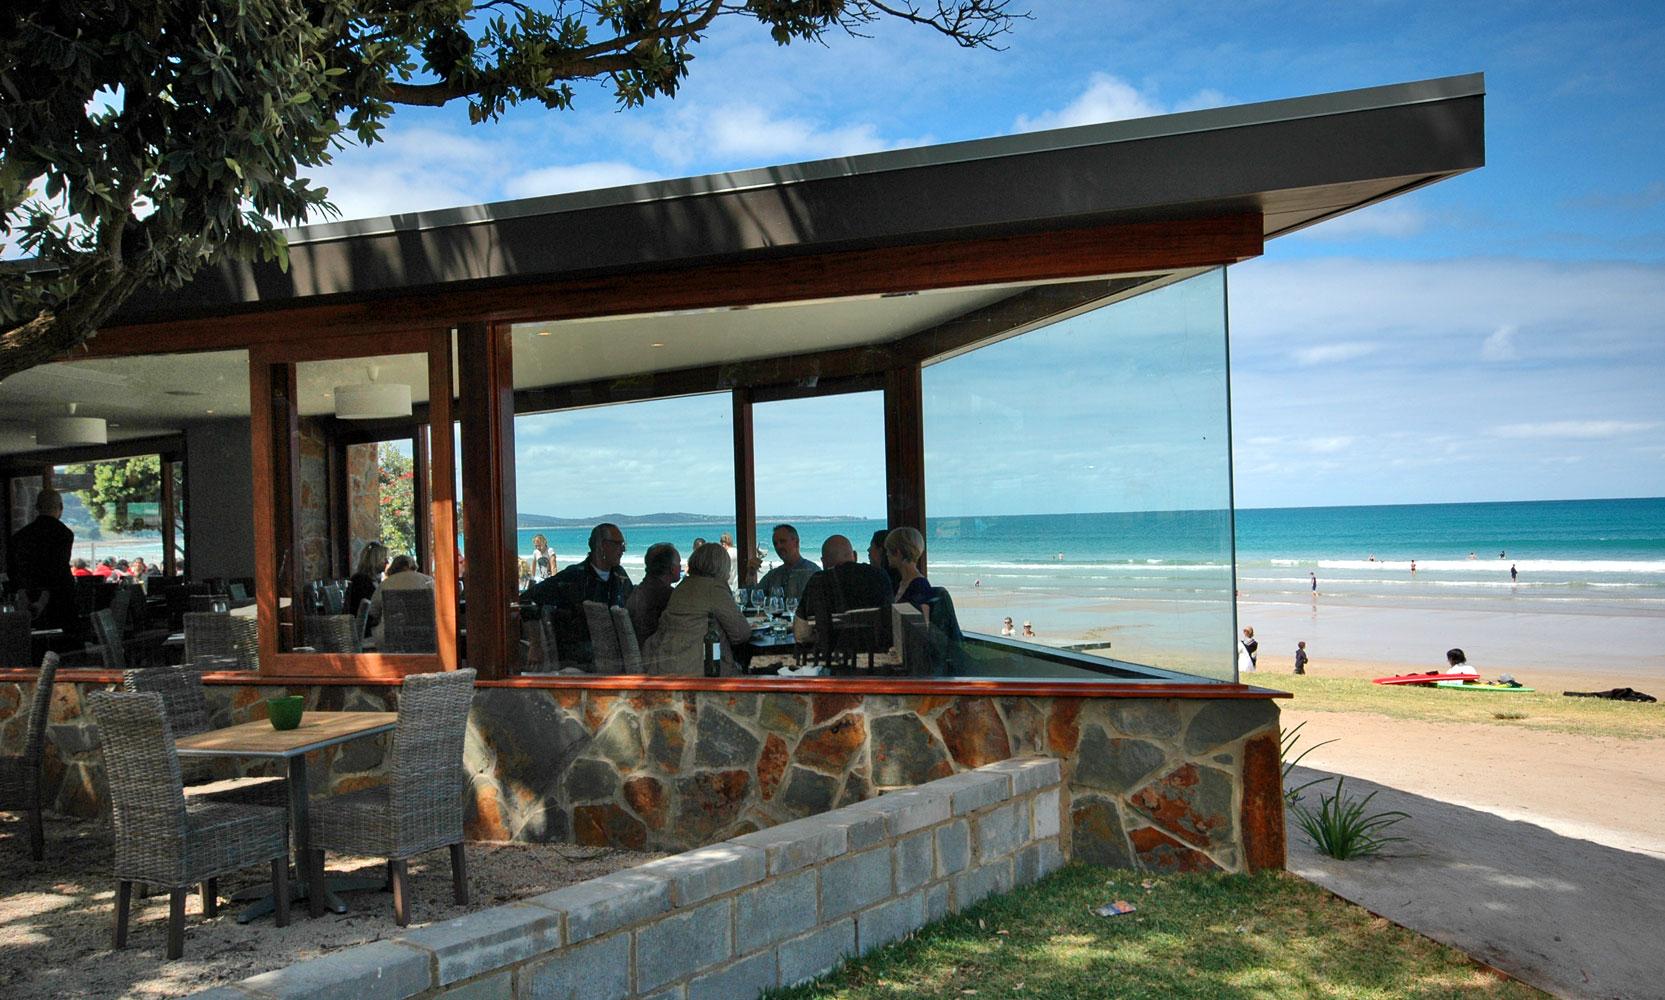 Lorne Beach Pavilion - 5 thị trấn bạn nên ghé thăm khi đi Great Ocean Road